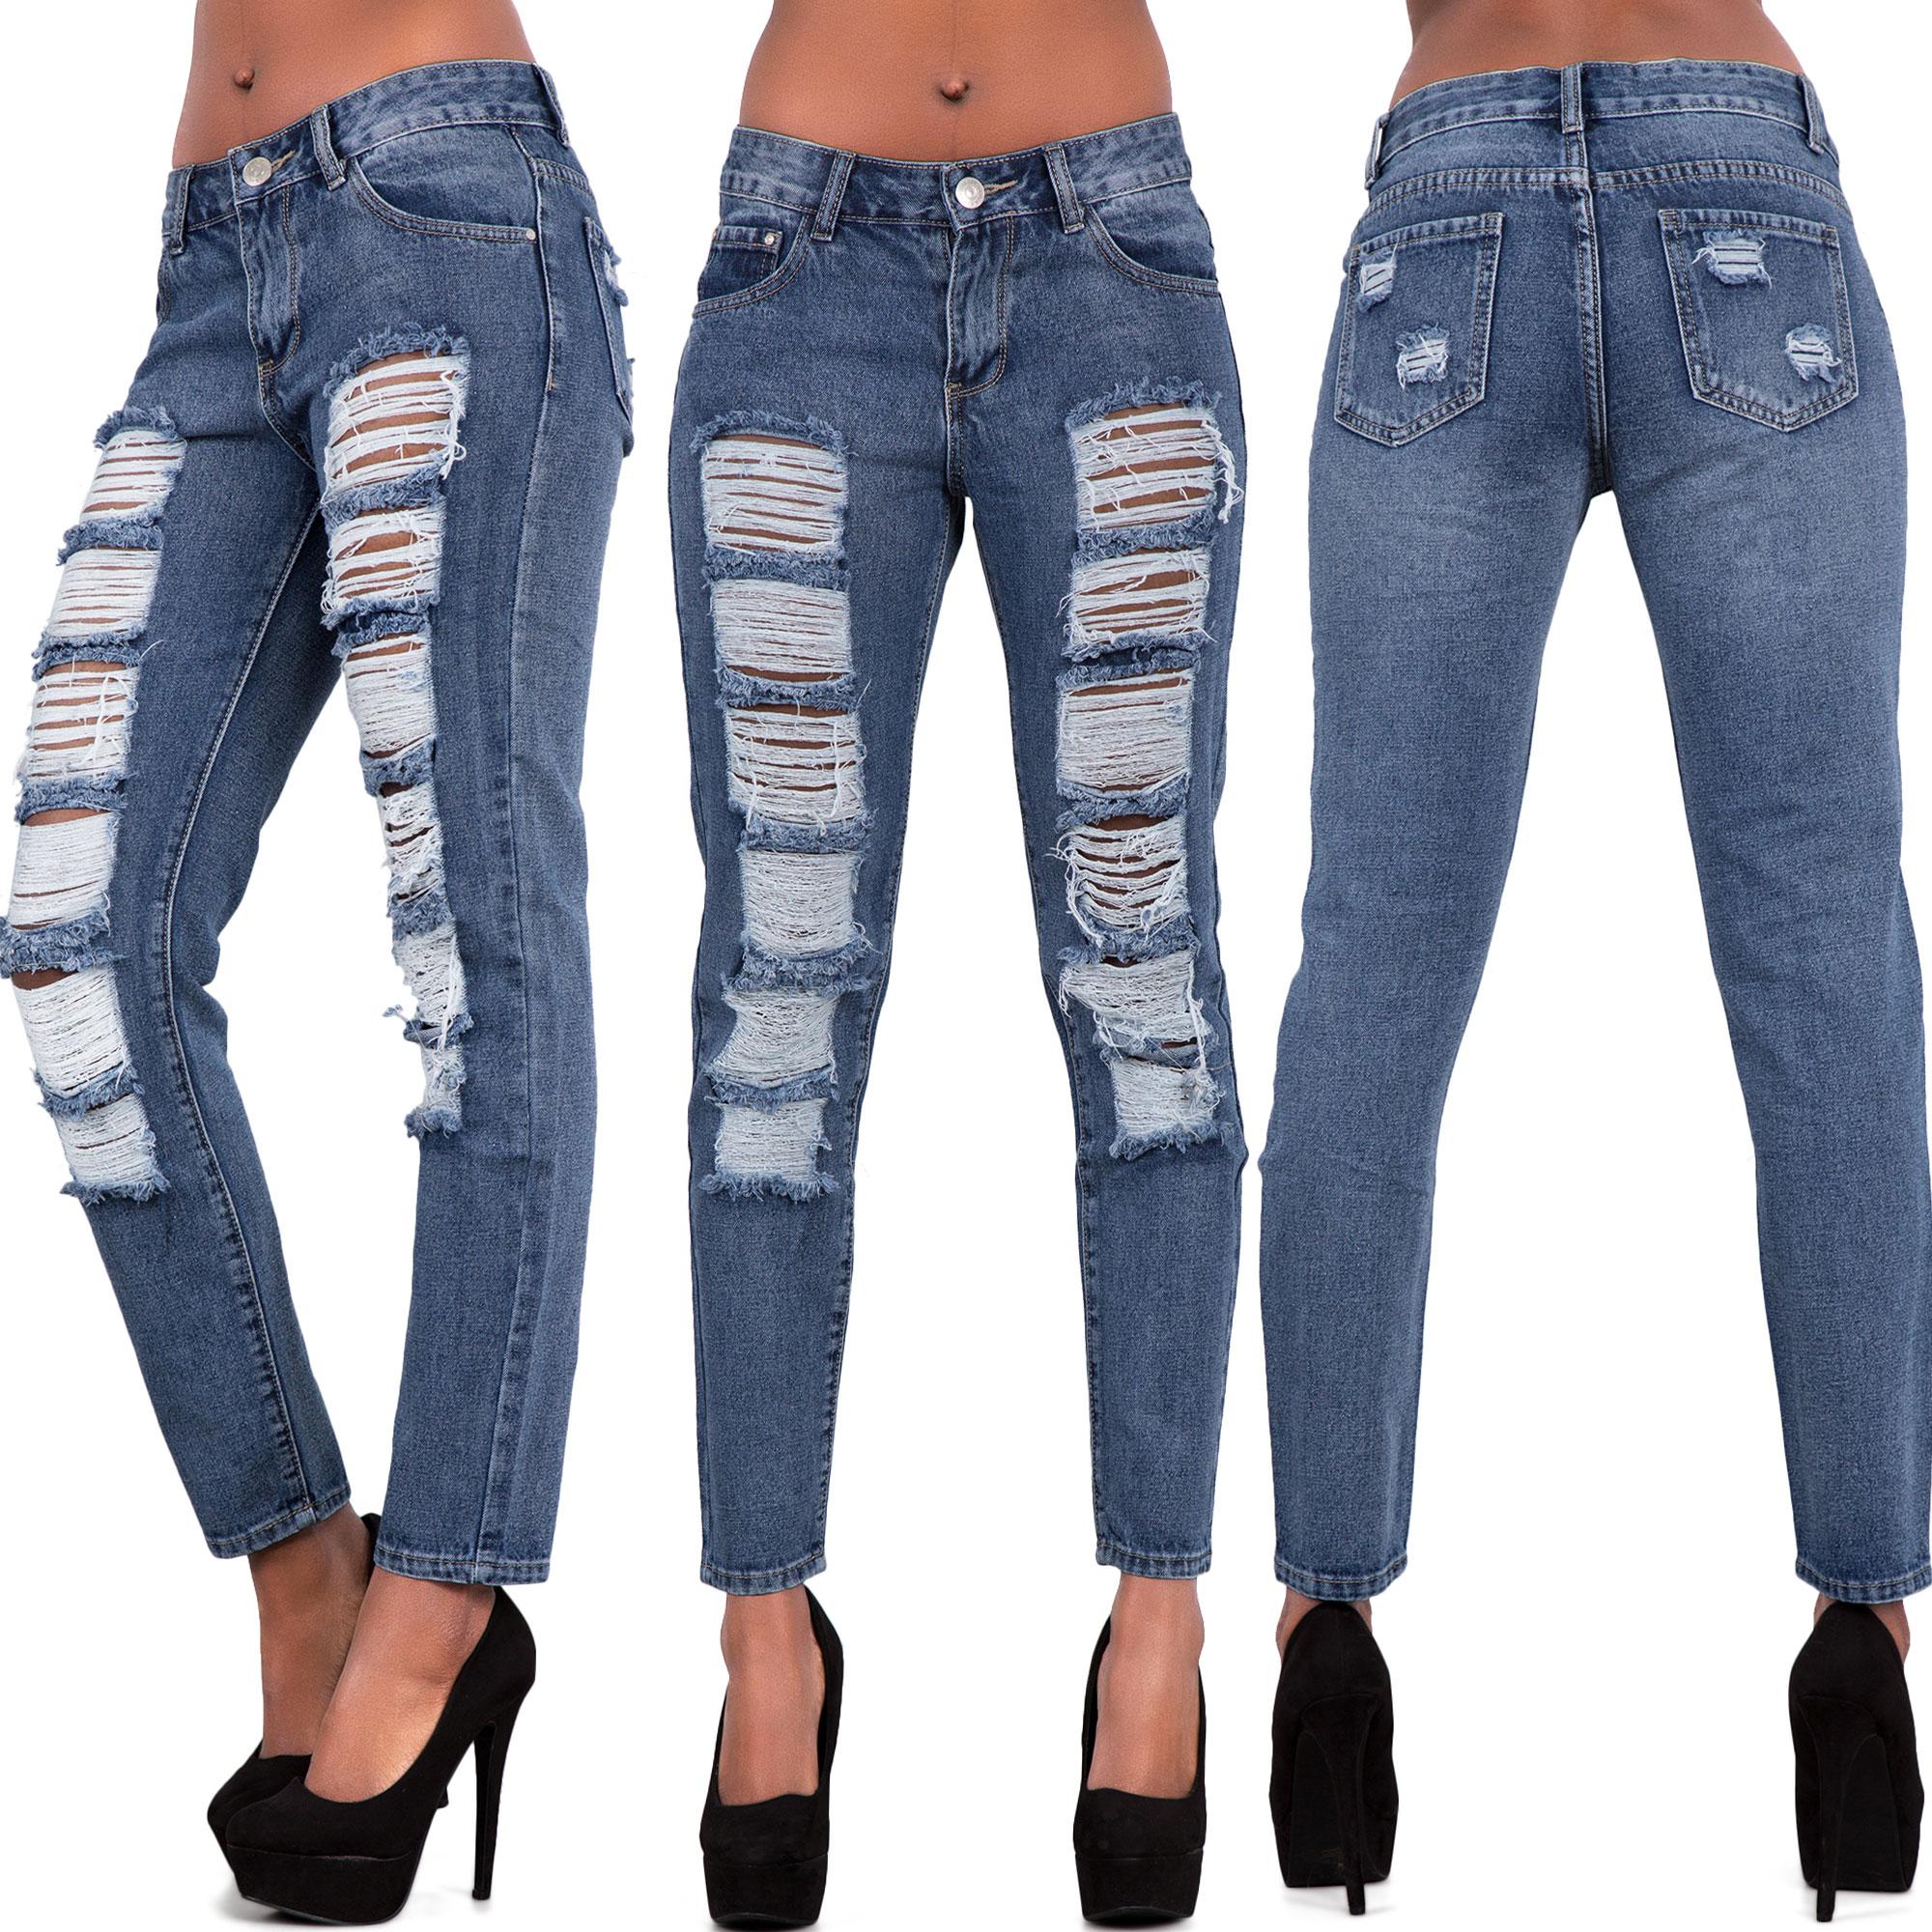 New-Womens-Ladies-Ripped-Skinny-Jeans-Slim-Fit-Denim-Pants-Size-6-8-10-12-14-16